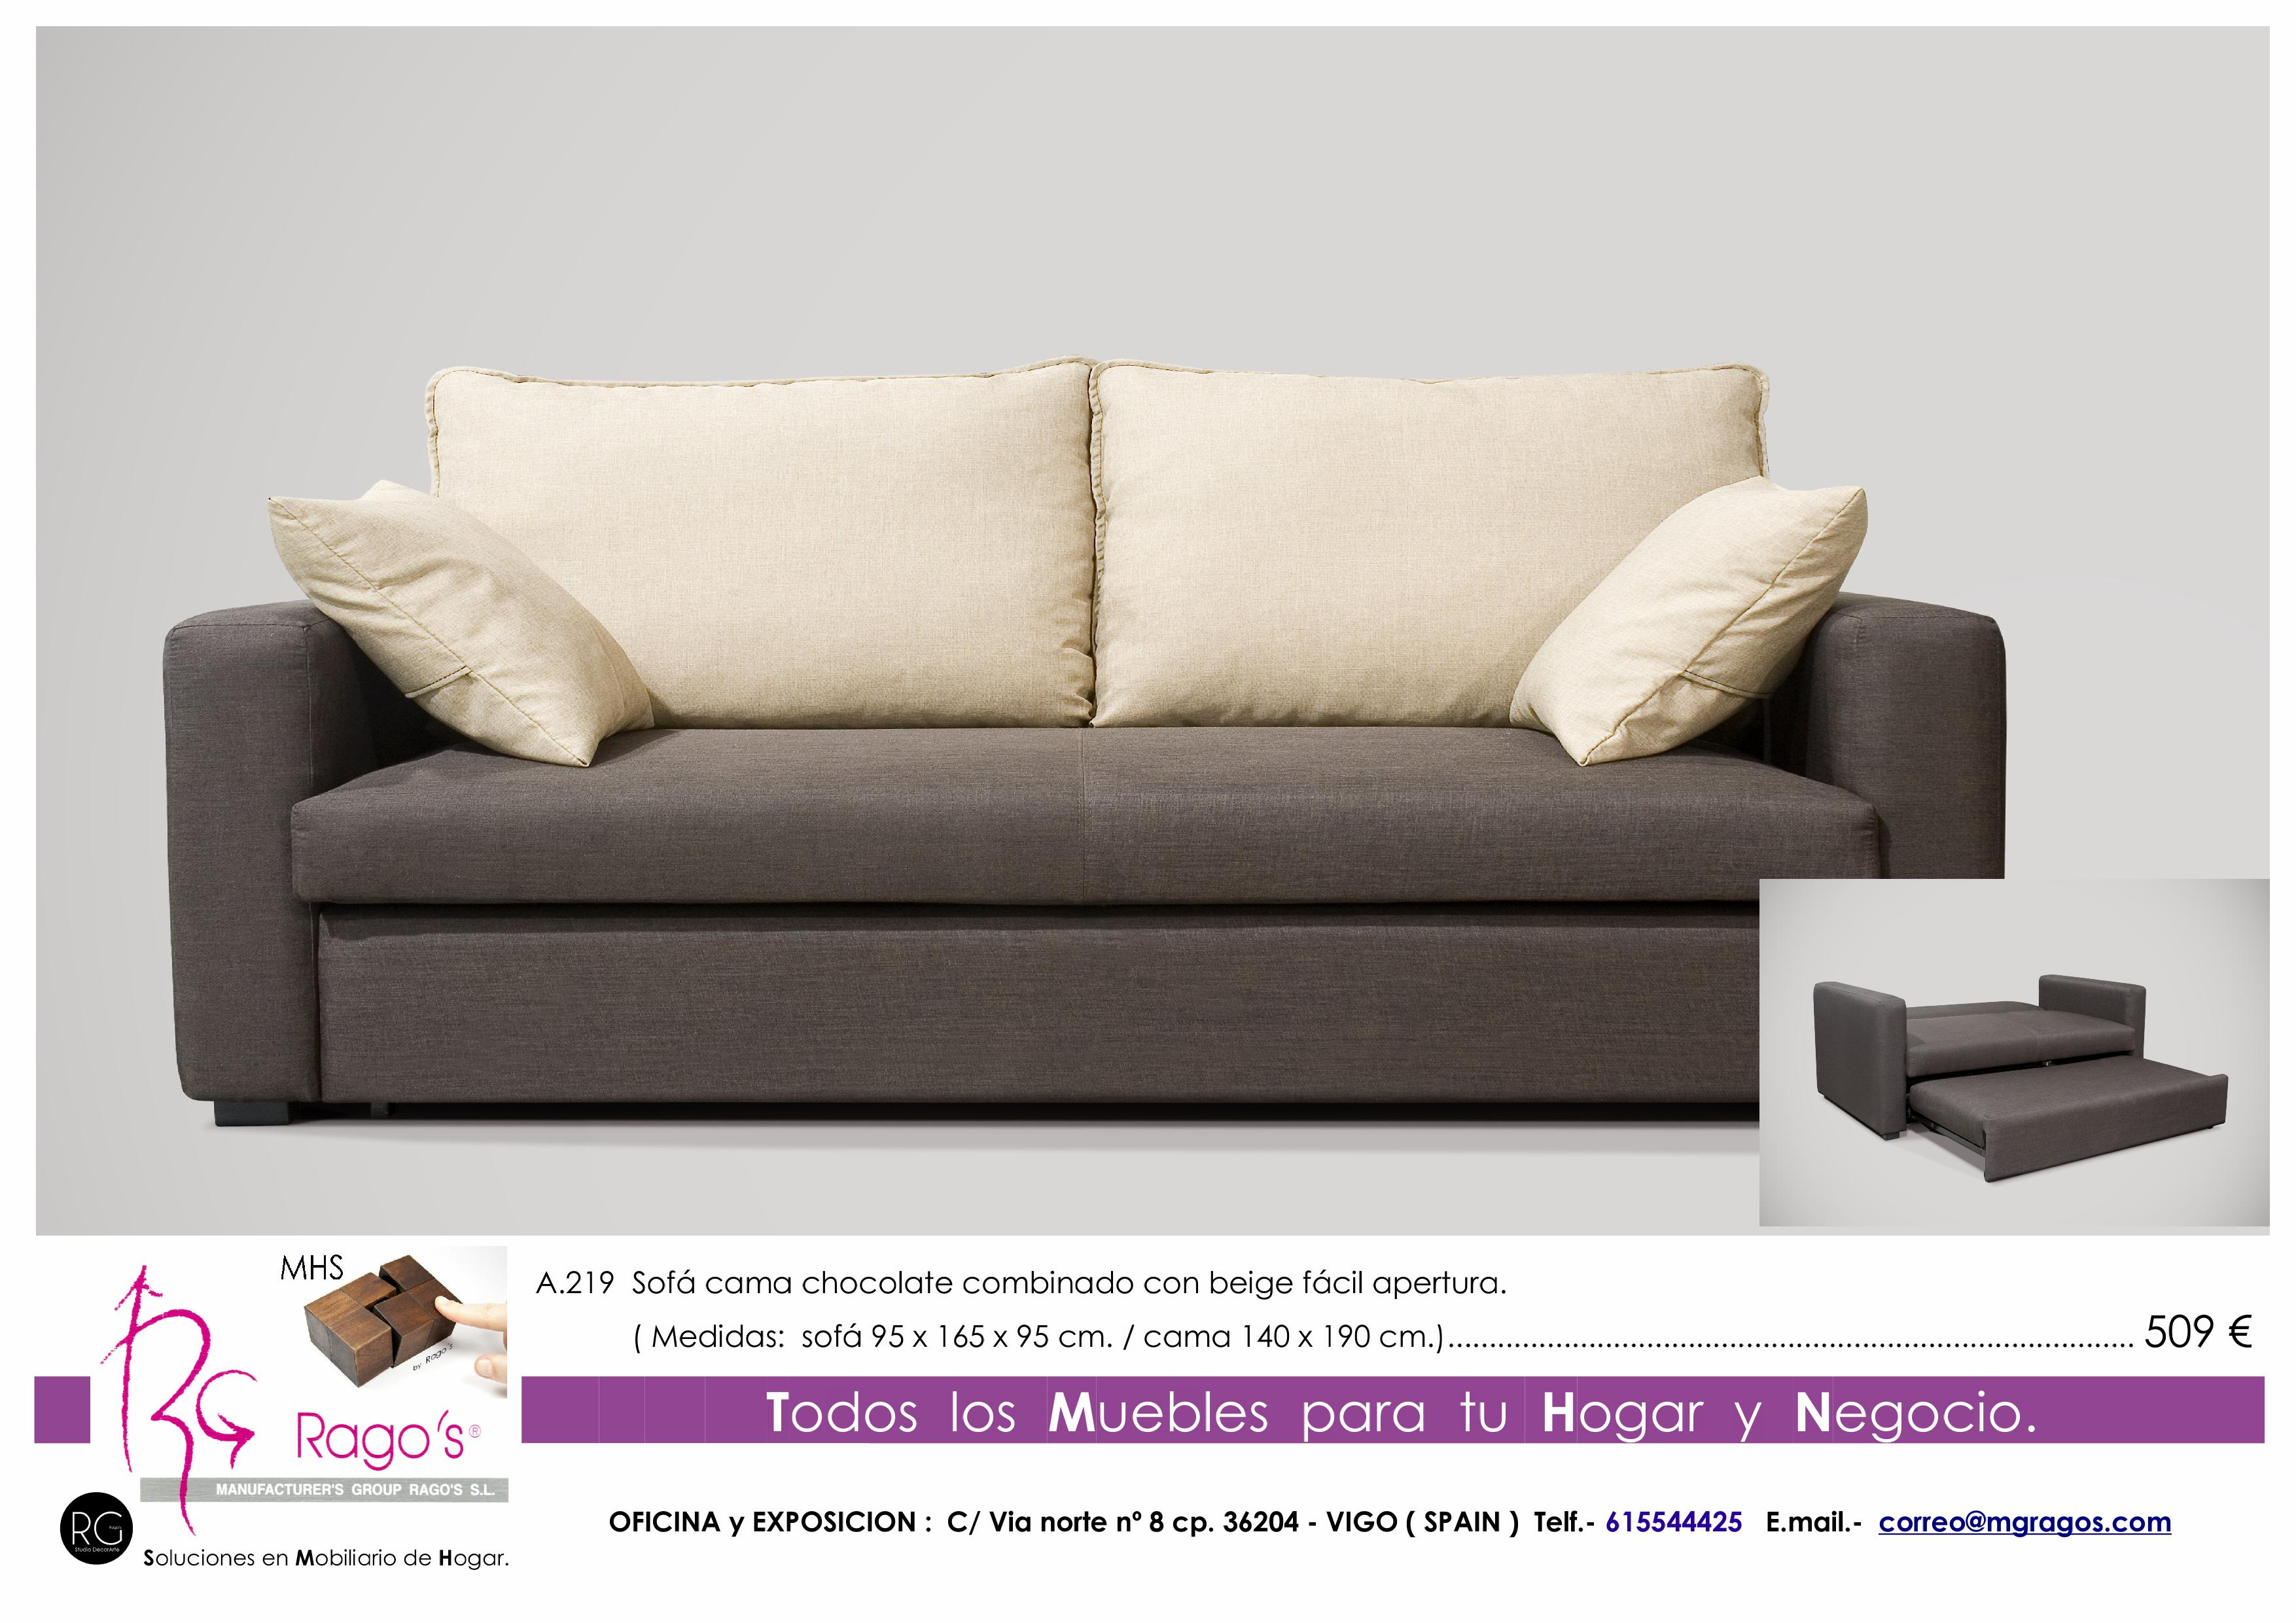 A.219 Sofa Cama Pag. nº 19